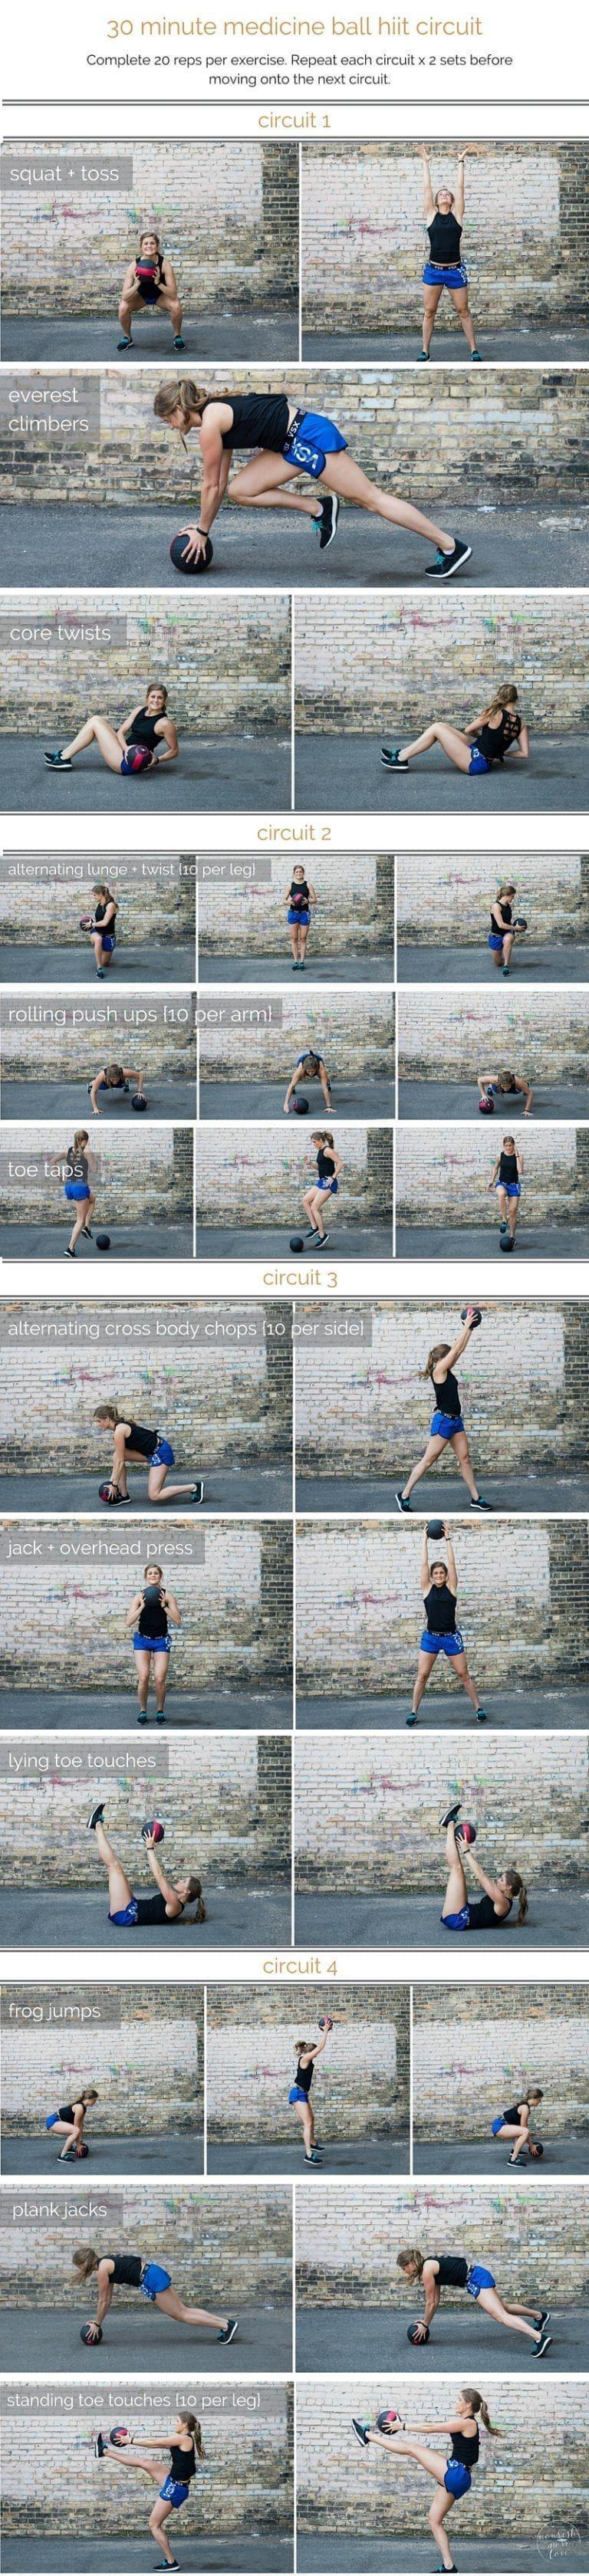 #Ball #Circuit #fitn #fitness #HIIT #langhantel  #circuit #fitness #langhantel #langhantelfitness